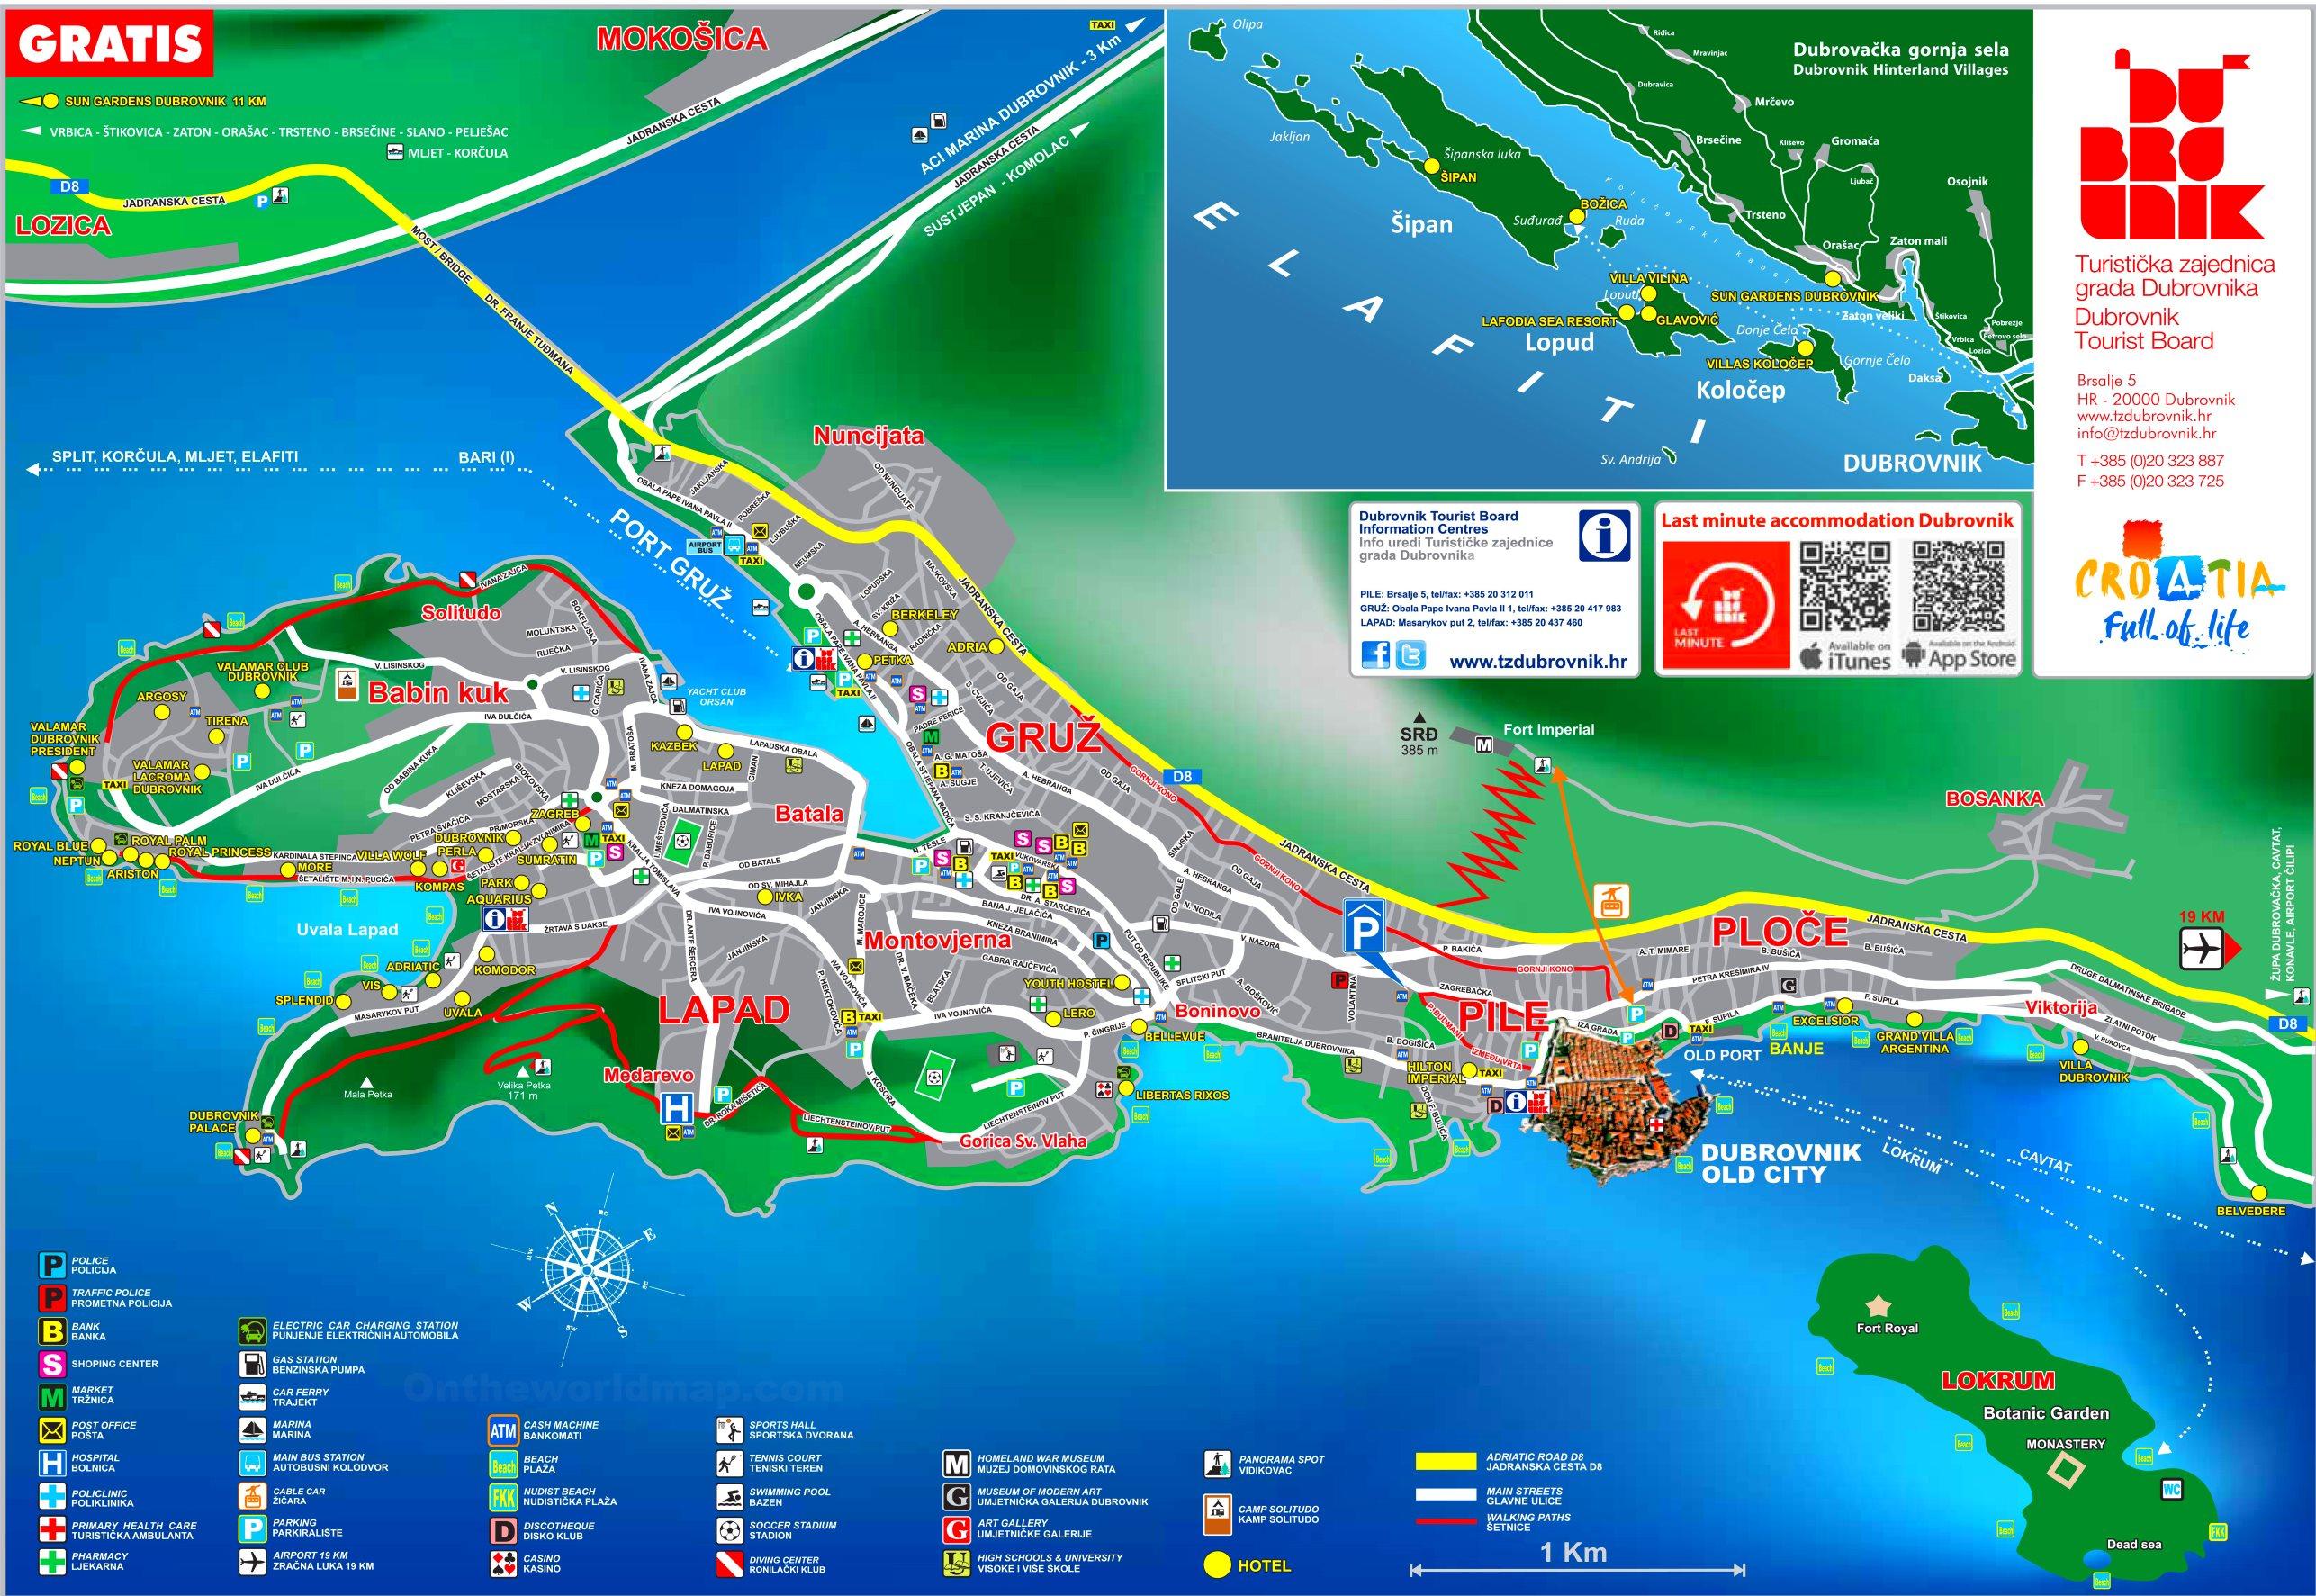 Dubrovnik hotel map on